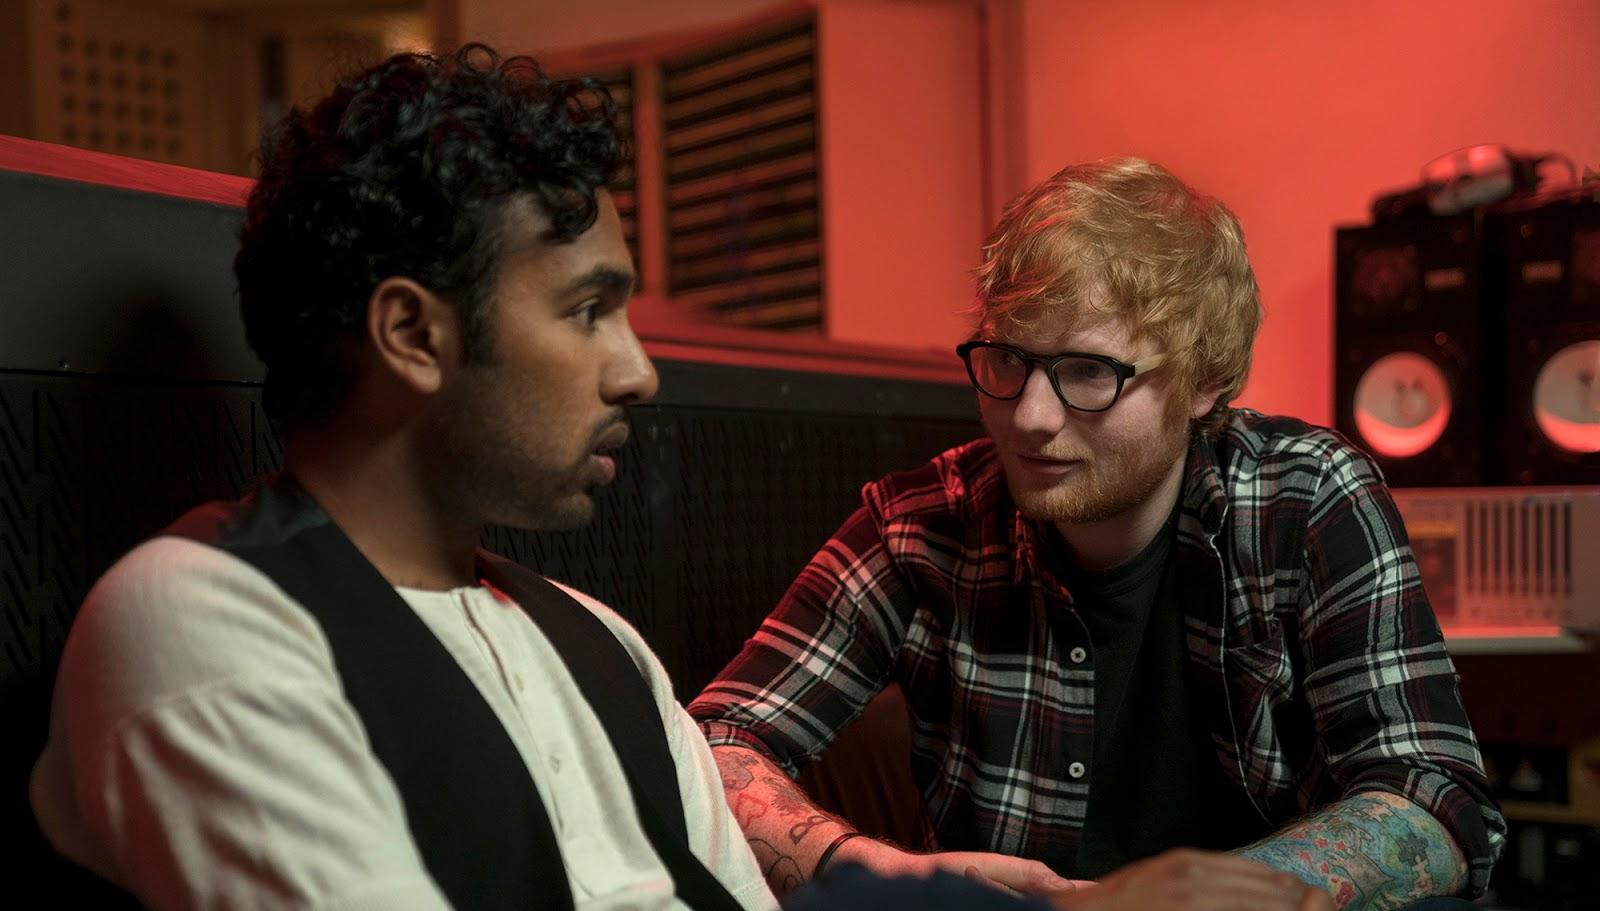 Himesh Patel and Ed Sheeran - Soundtrack Yesterday